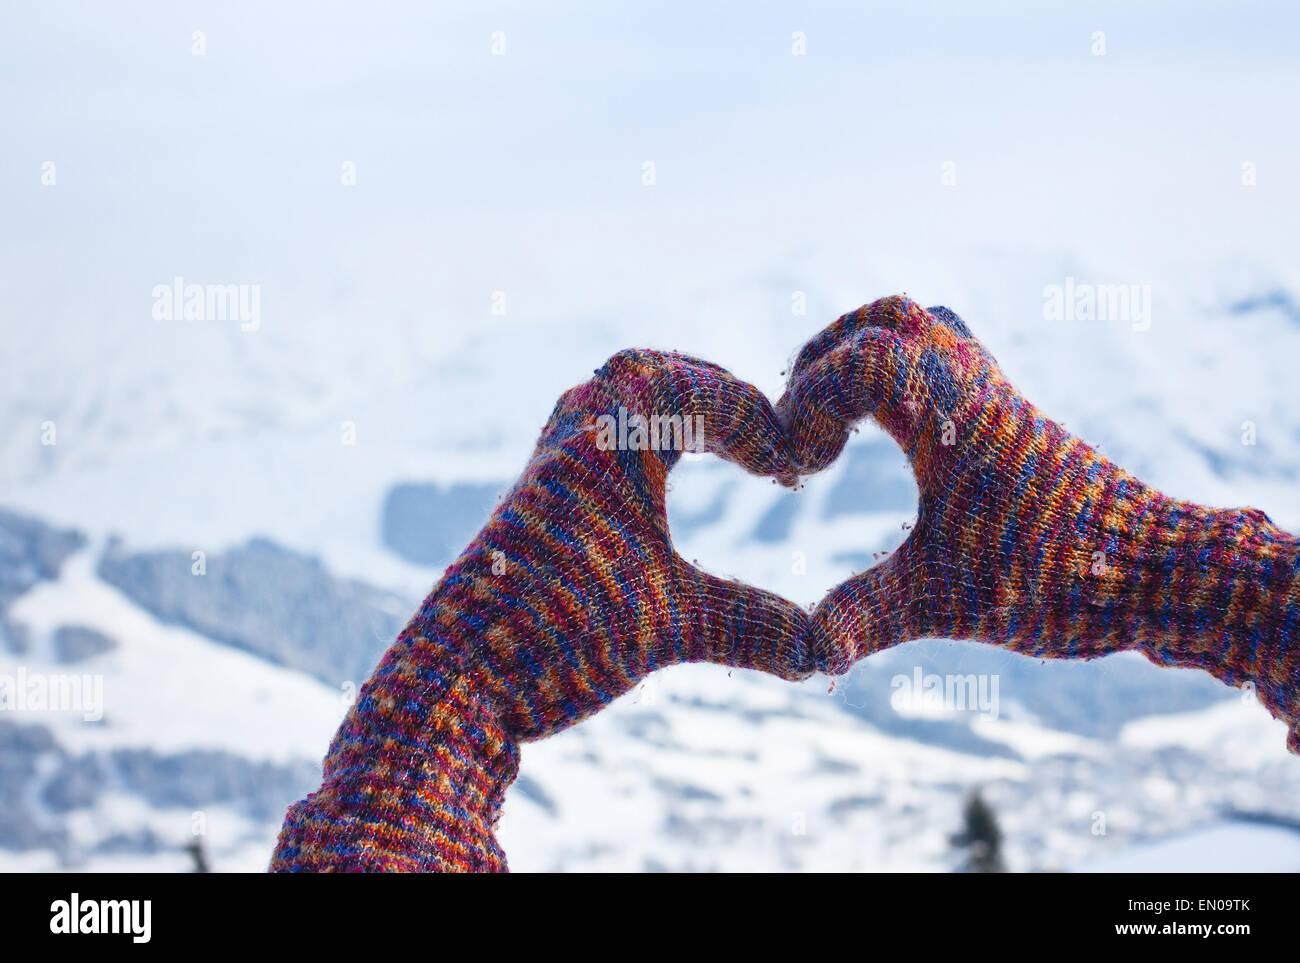 love winter - Stock Image